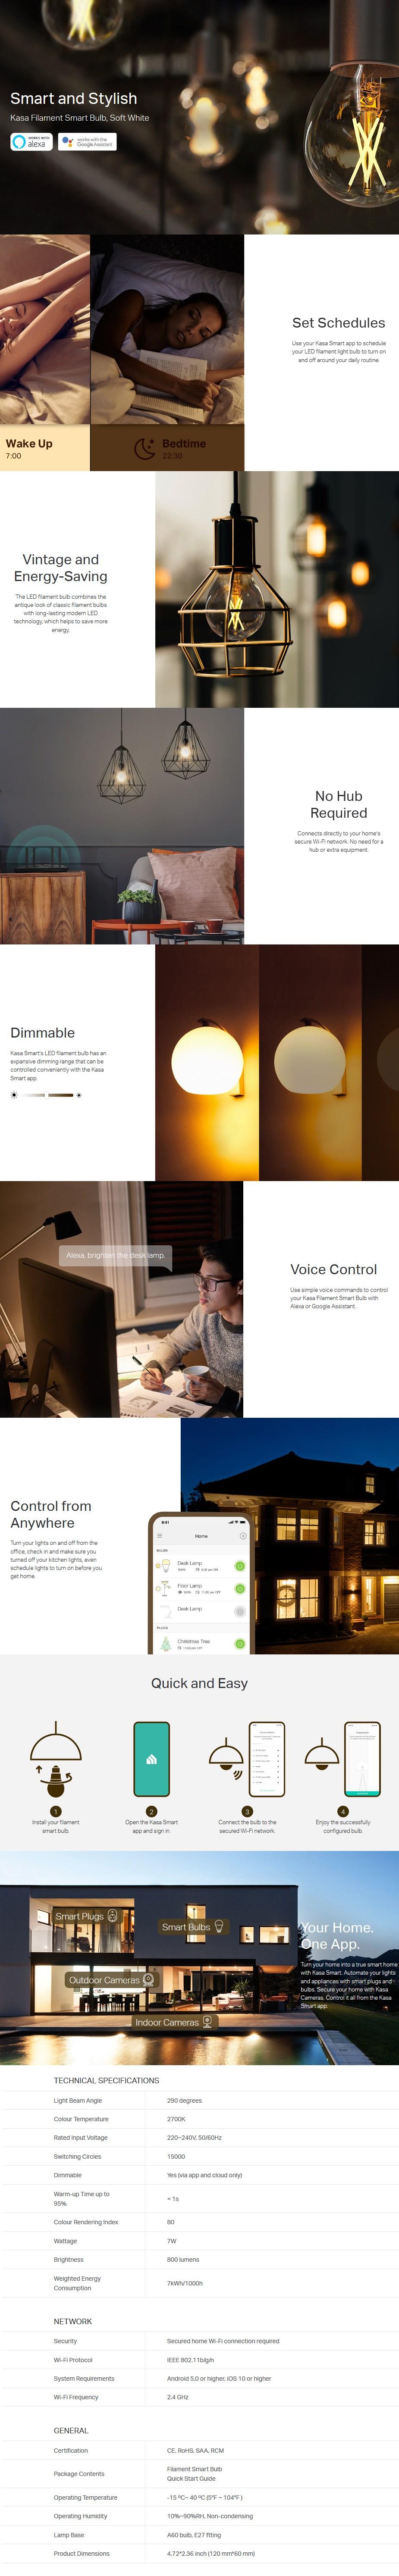 tplink-kl50-kasa-filament-smart-wifi-led-bulb-with-soft-white-light-edison-ac28499.jpg